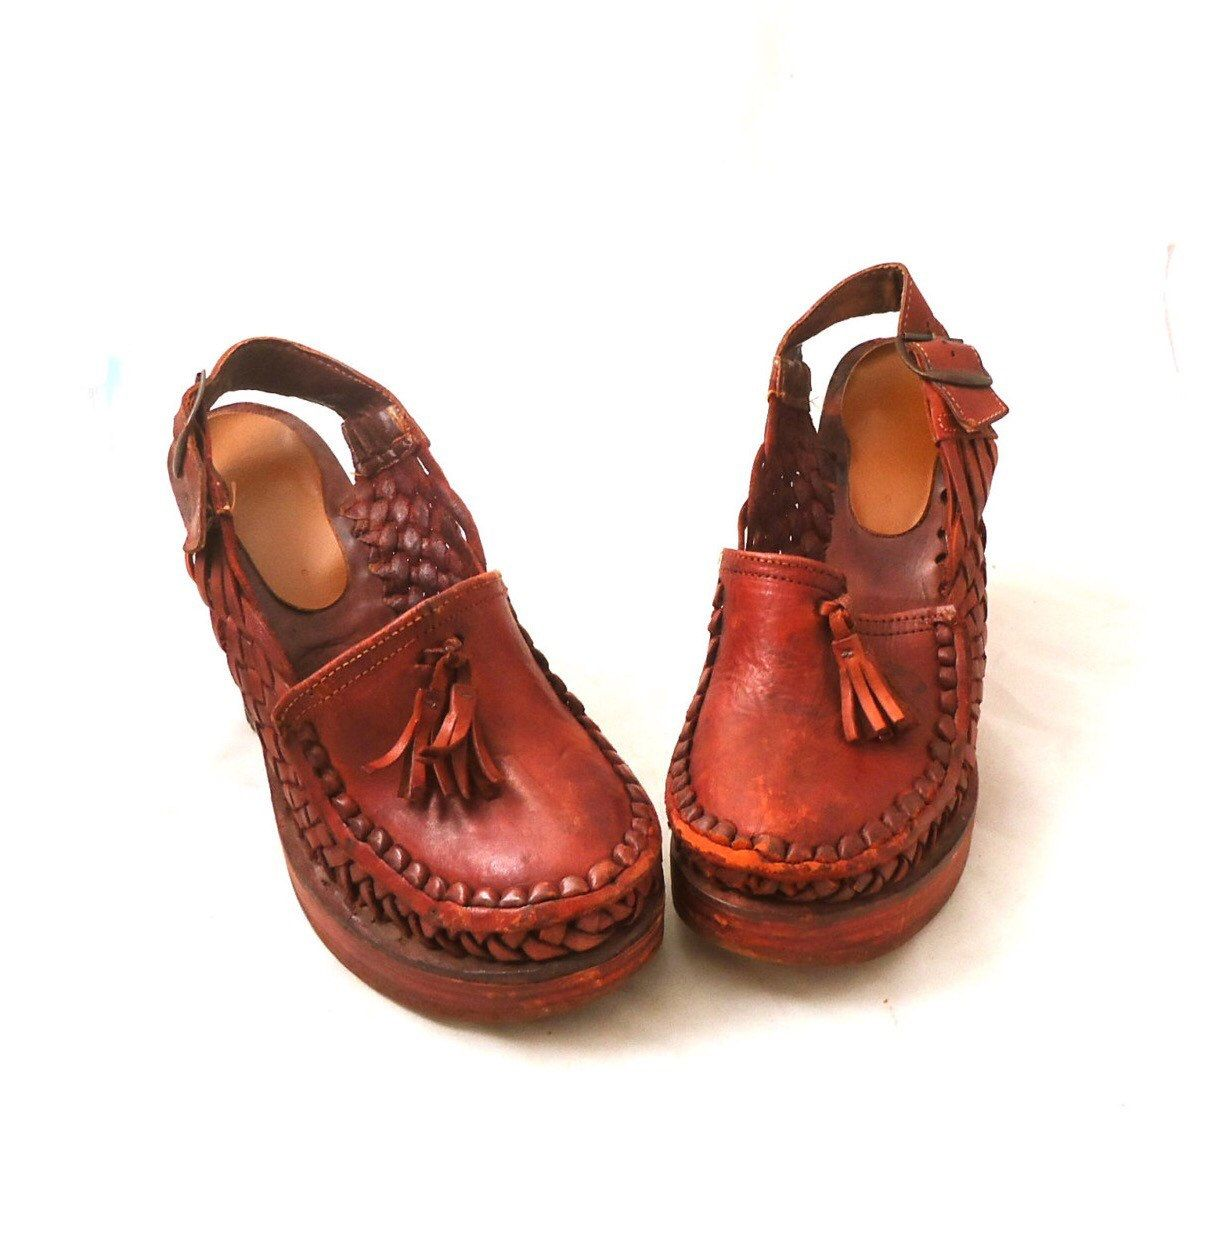 6c49d5940ff Platform Clogs Wood Heels Split Wedge Oxblood Braided Weaved Leather ...